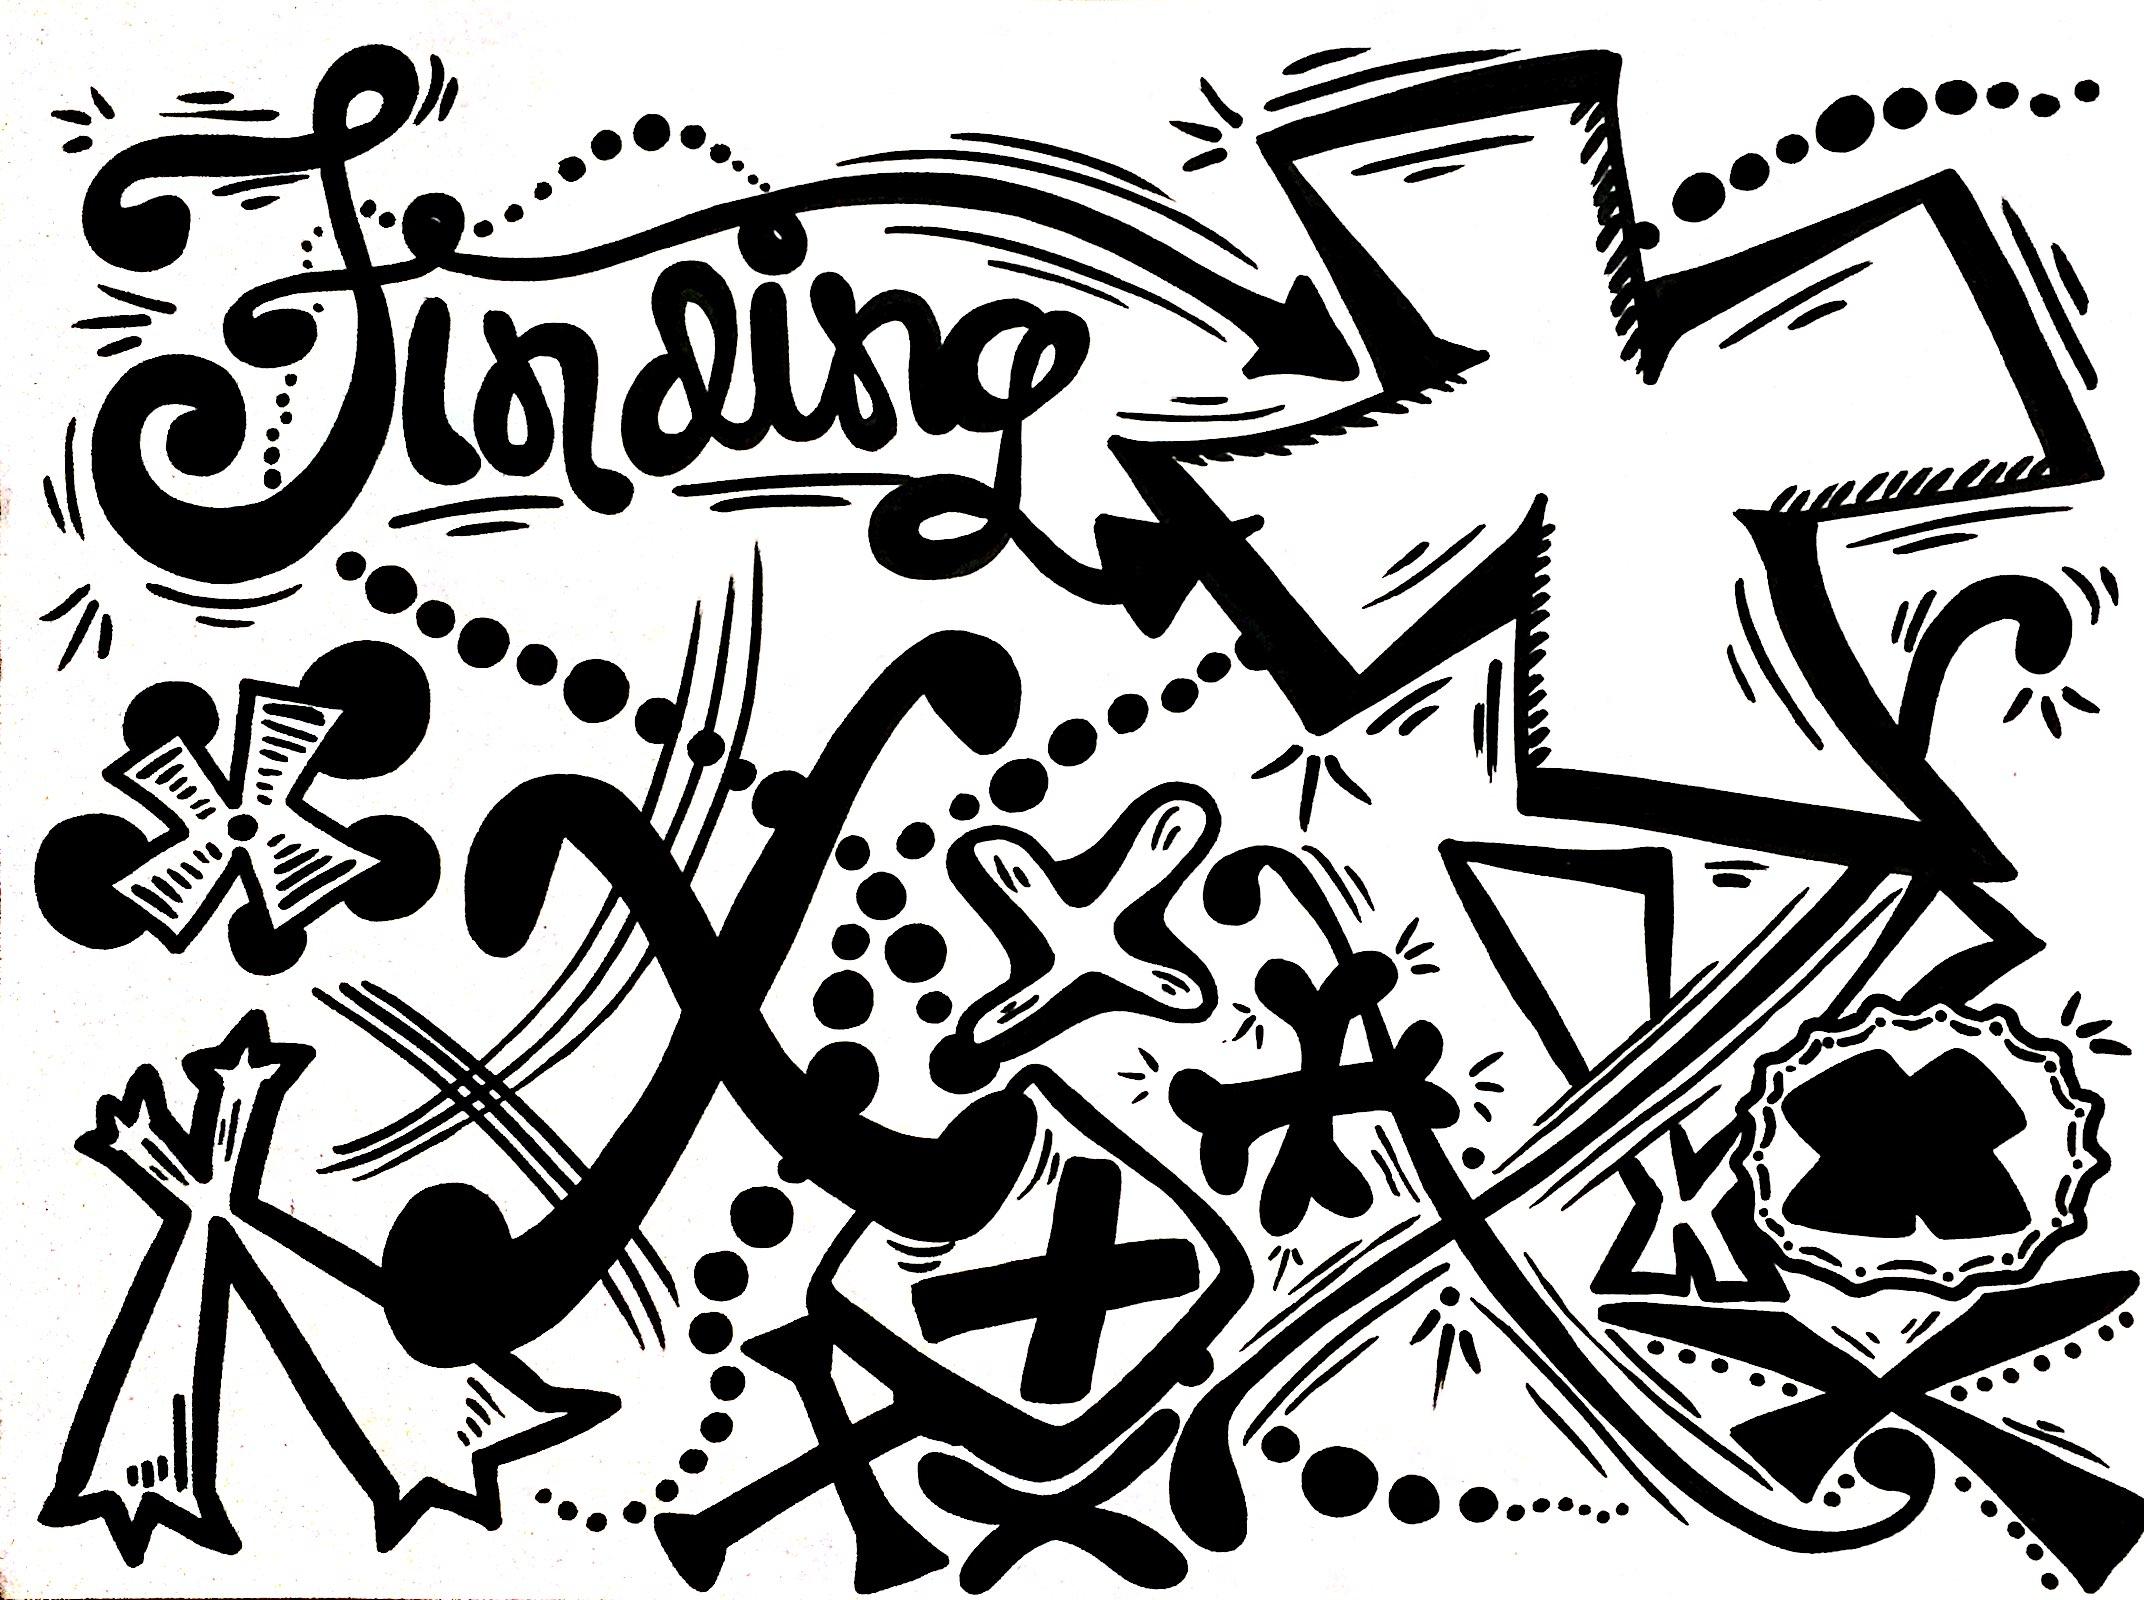 Creative Lettering - Finding X - TEDxBerkeley 2016